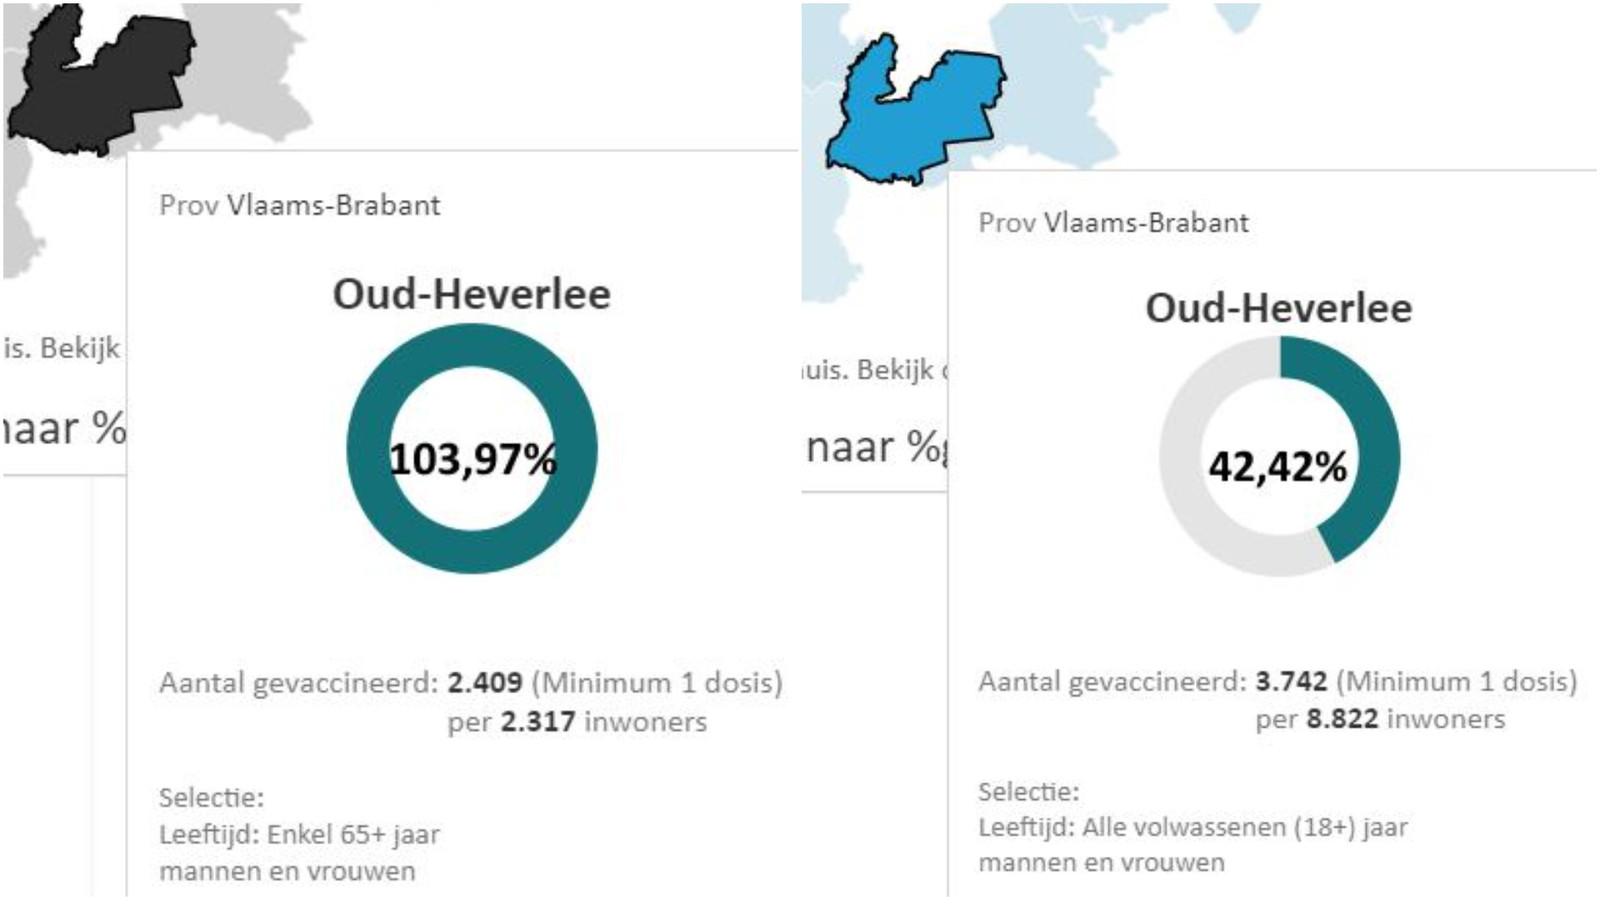 Straffe cijfers: 103.9% van 65-plussers in Oud-Heverlee gevaccineerd